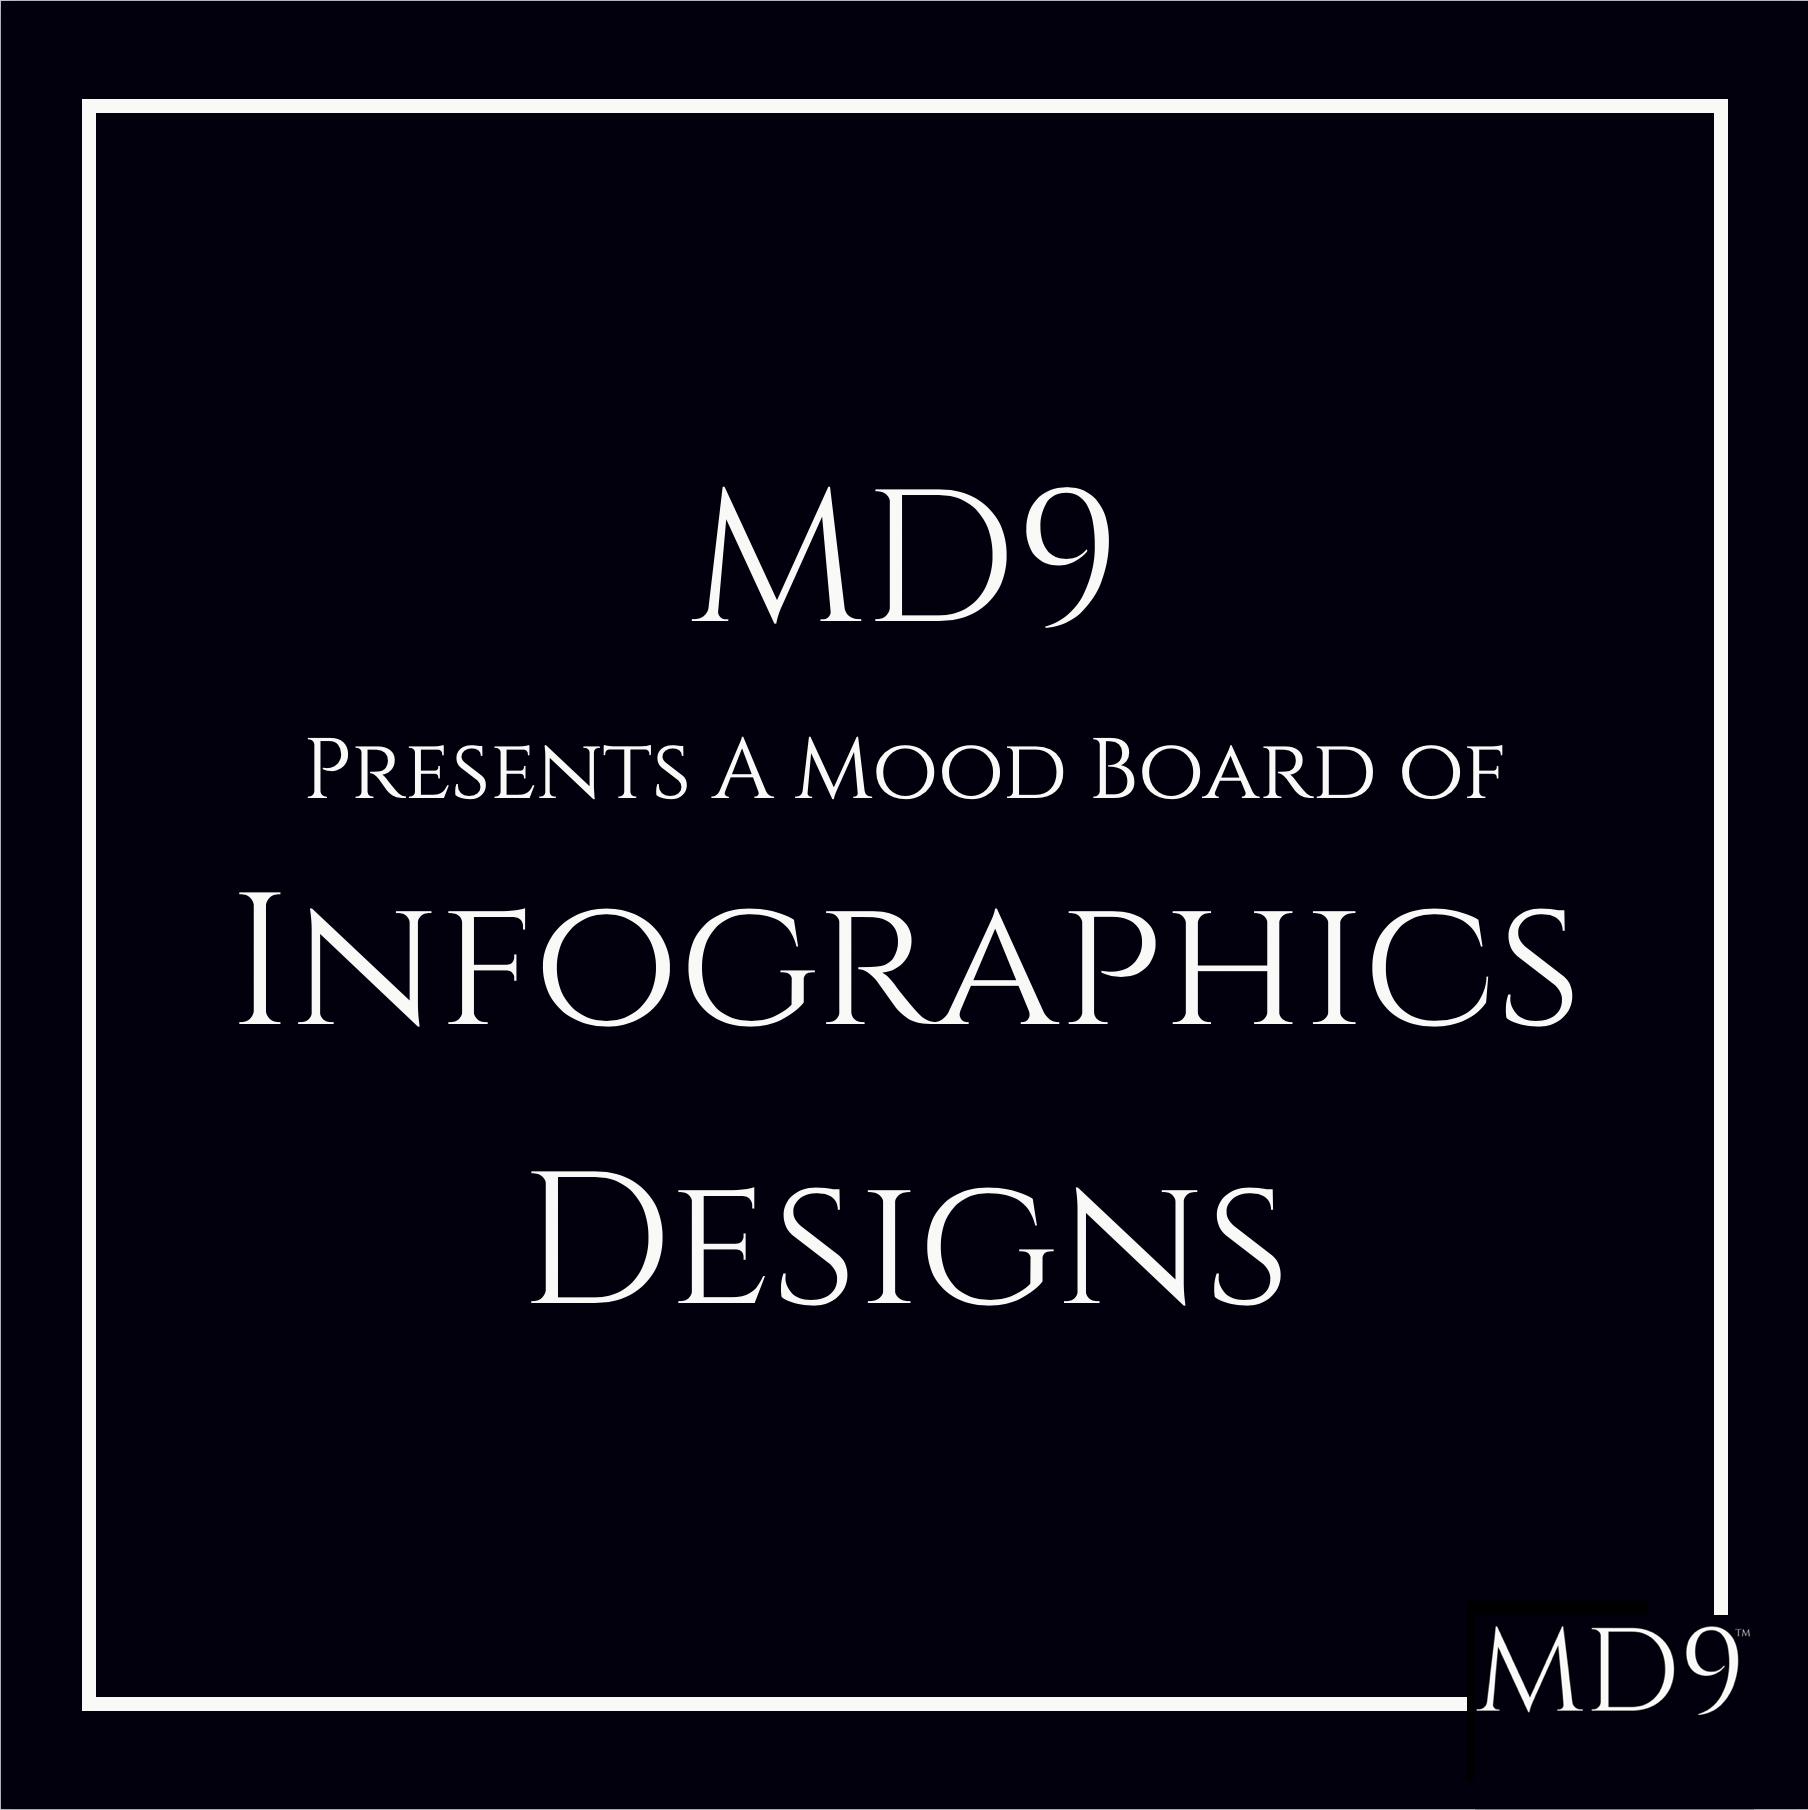 MD9's Design Mood Board – Infographics